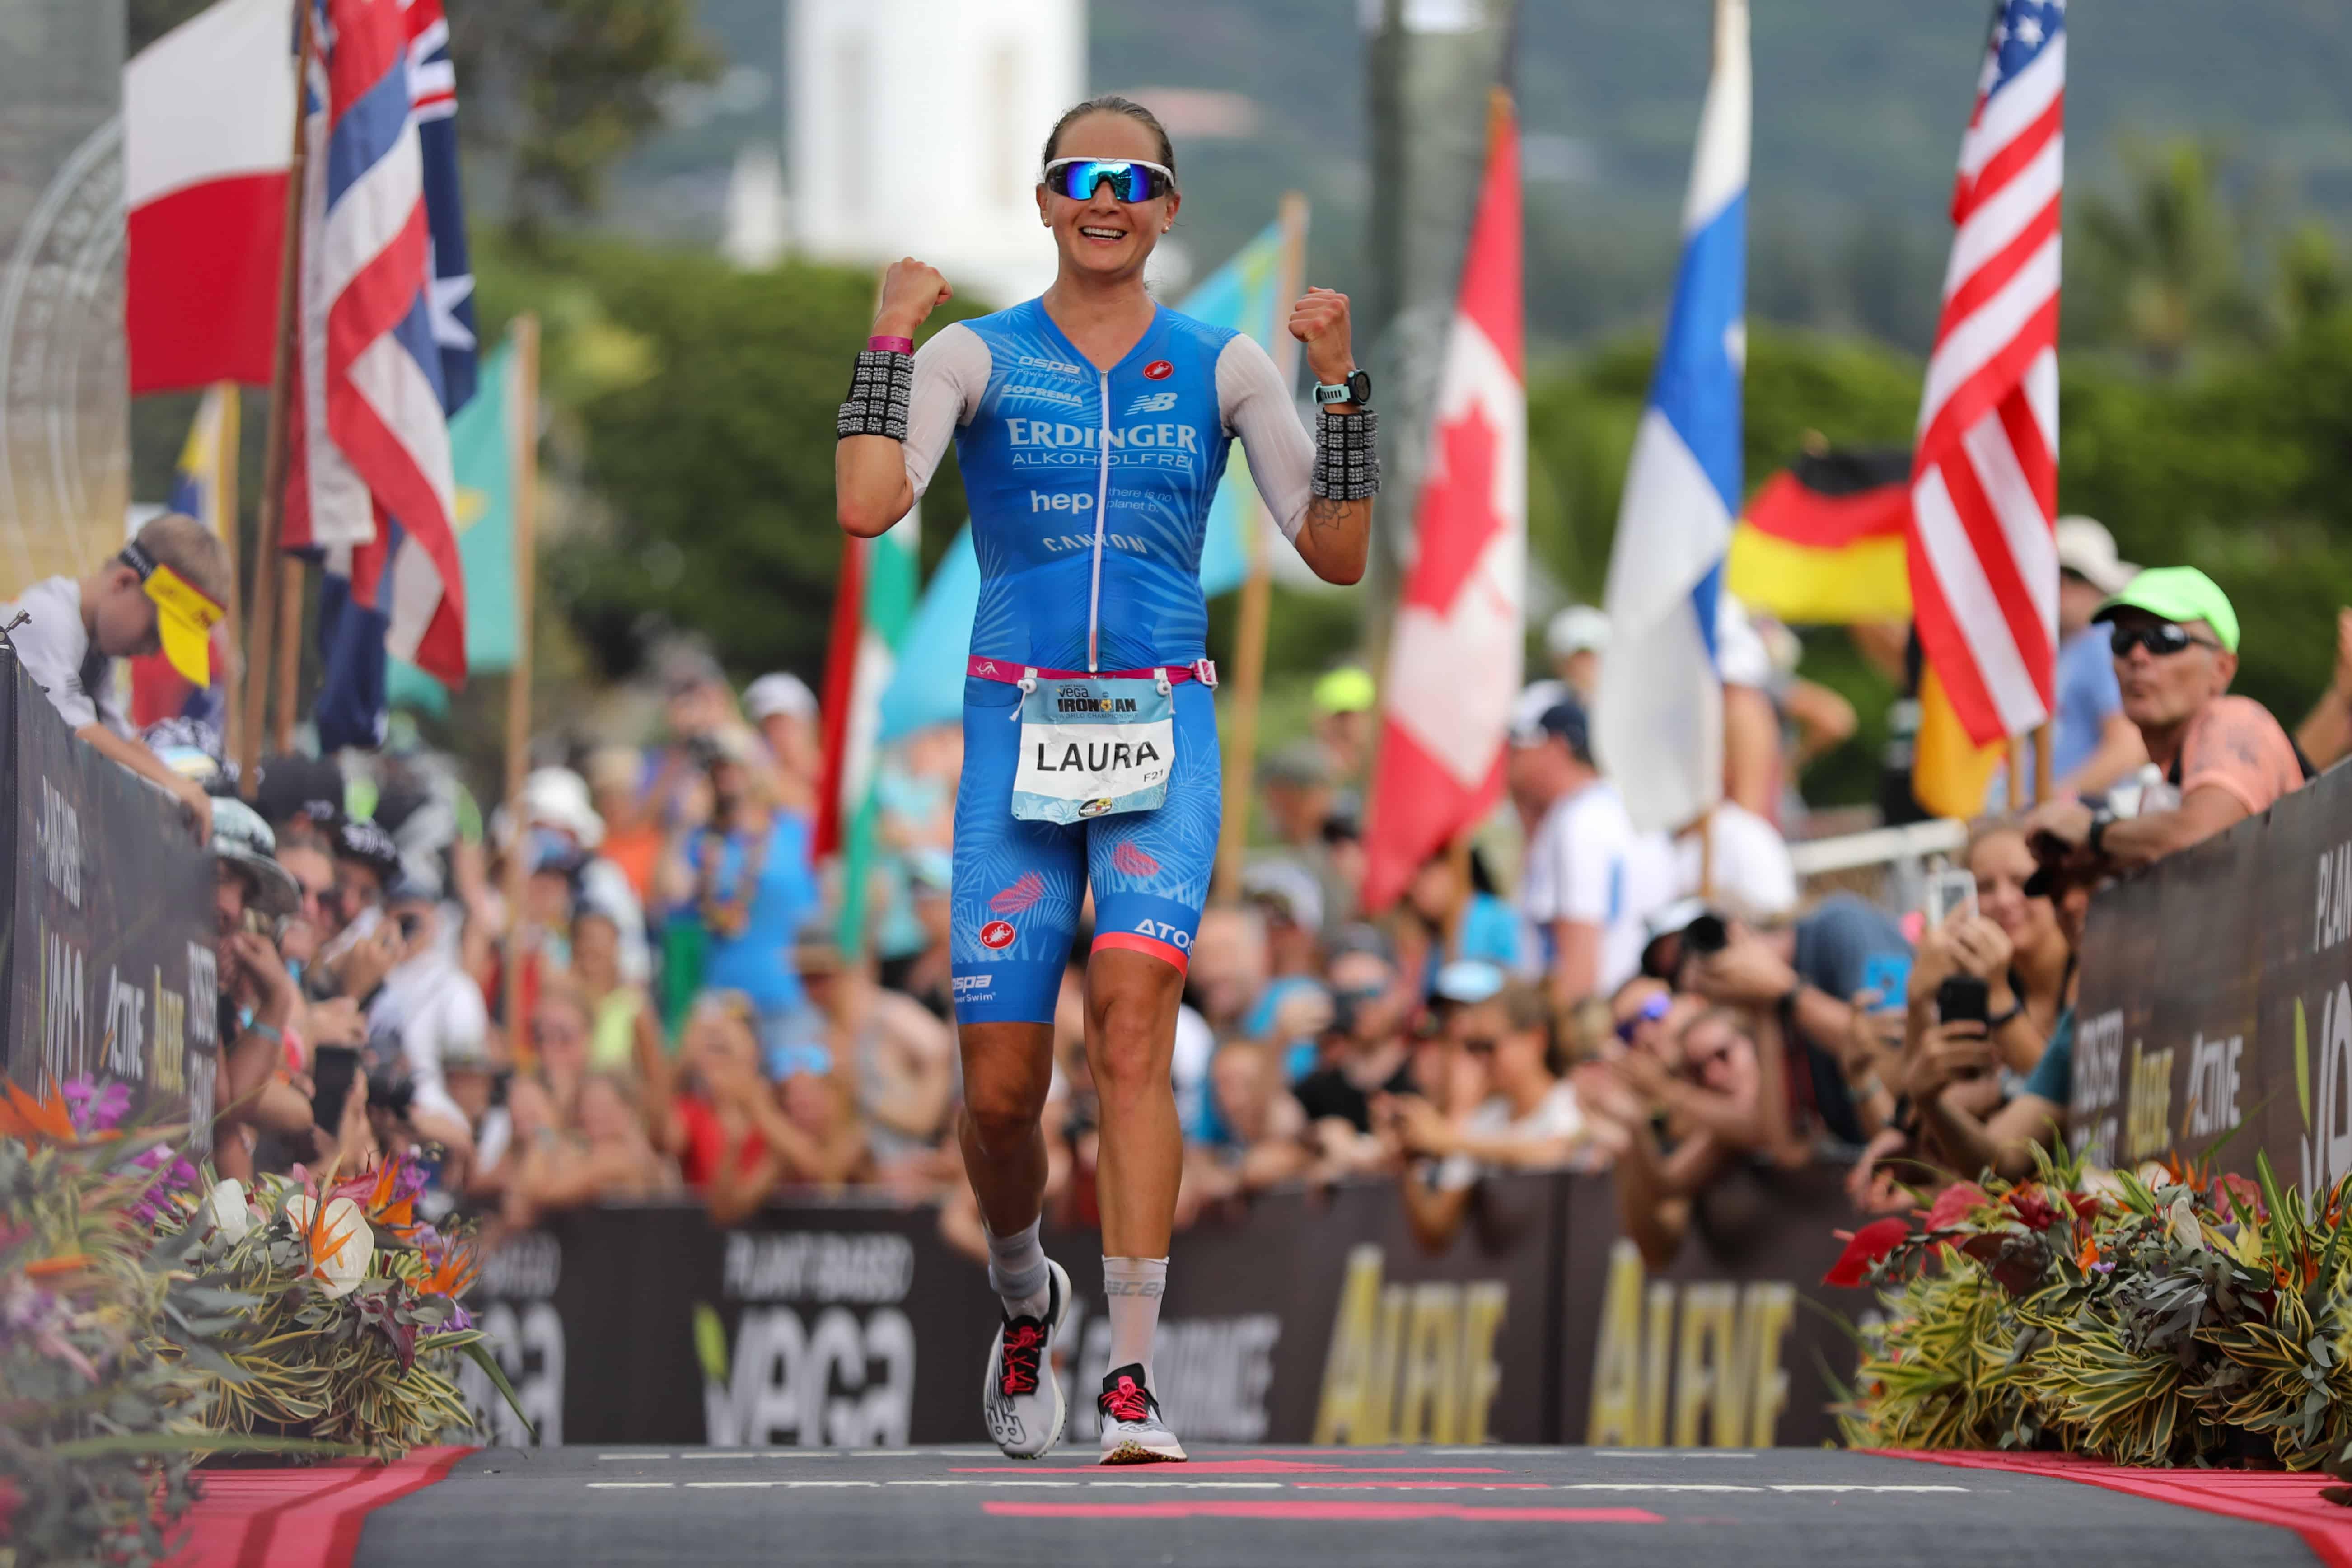 ASICS World Triathlon Team debuts at Astana World Cup | ITU